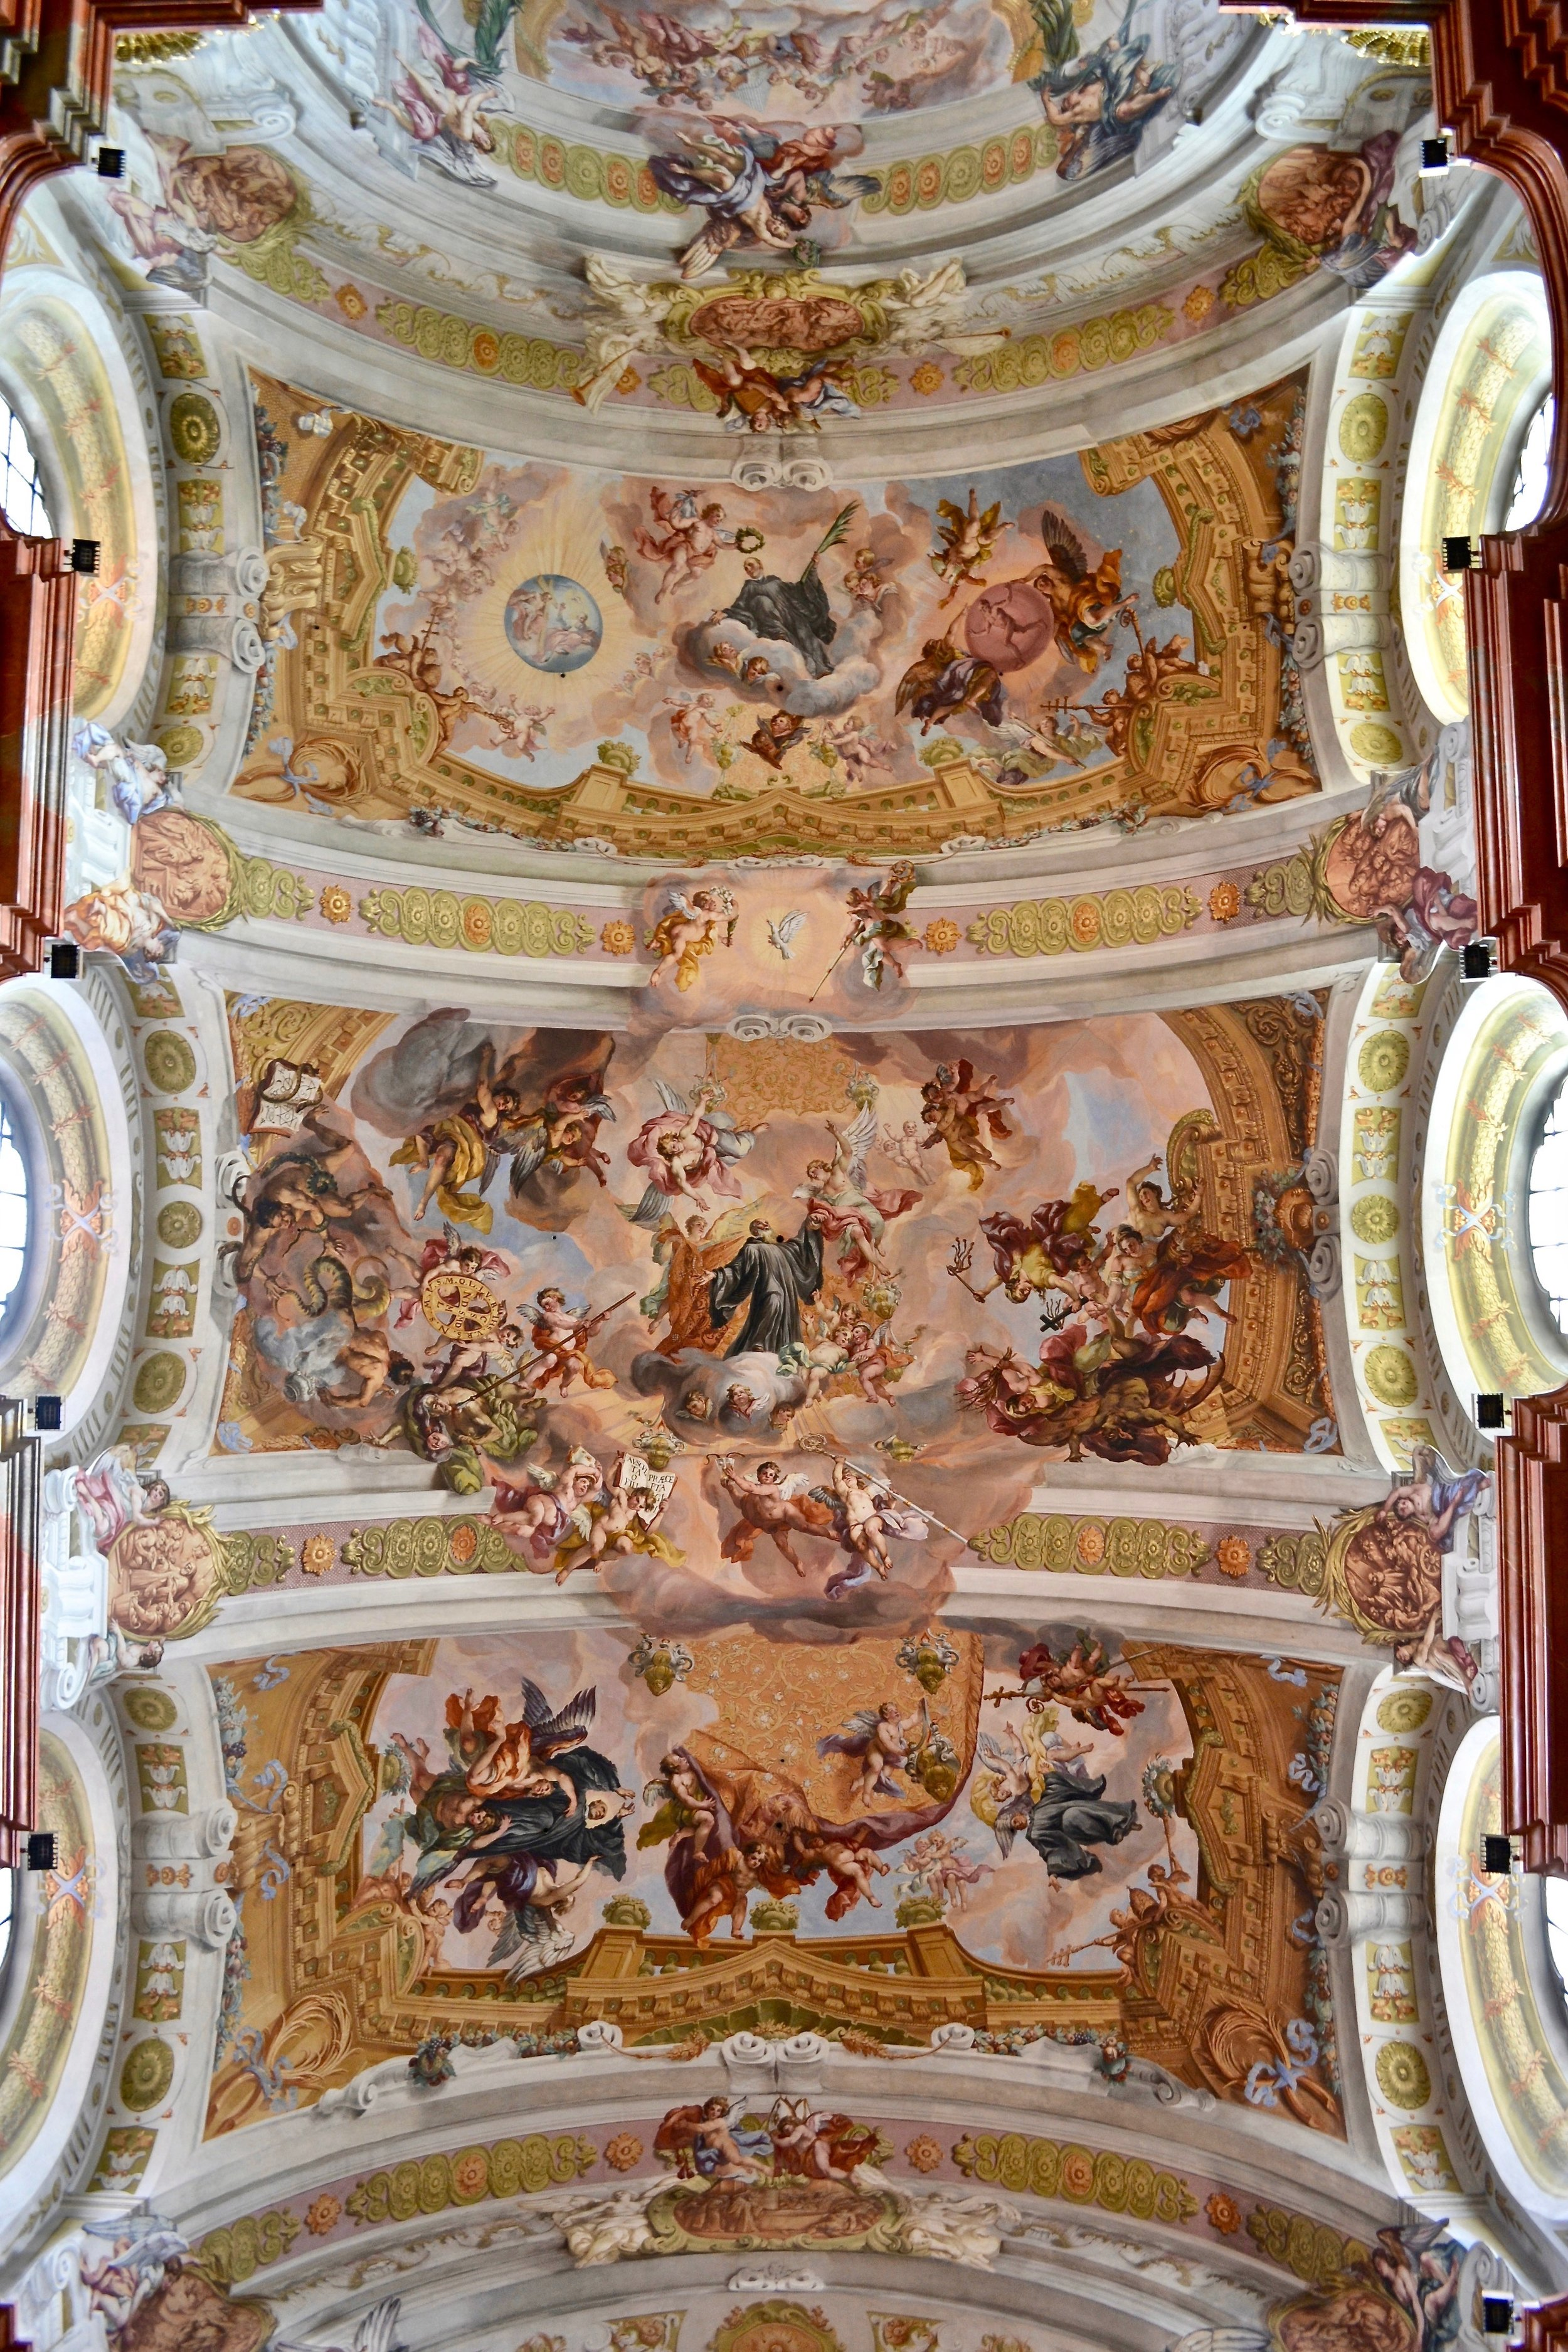 The Ceiling Fresco in the Abbey Church